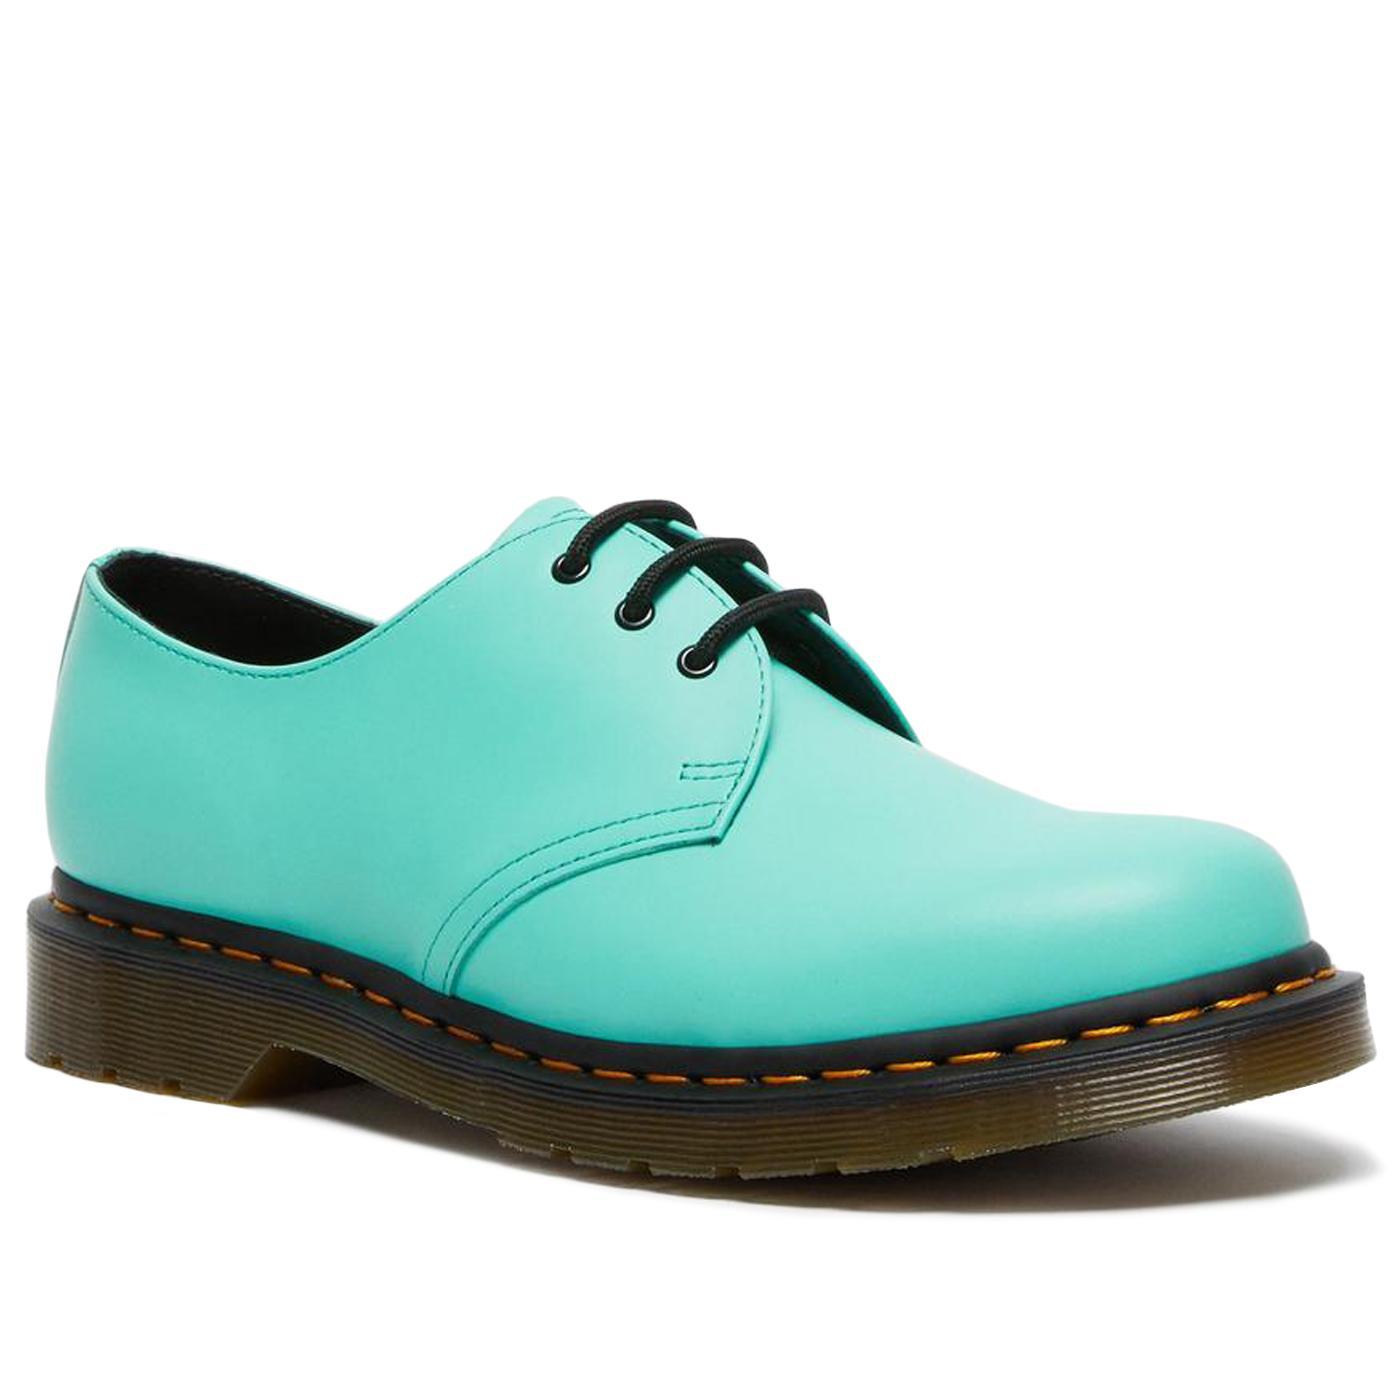 1461 DR MARTENS Women's Oxford Shoes PEPPERMINT